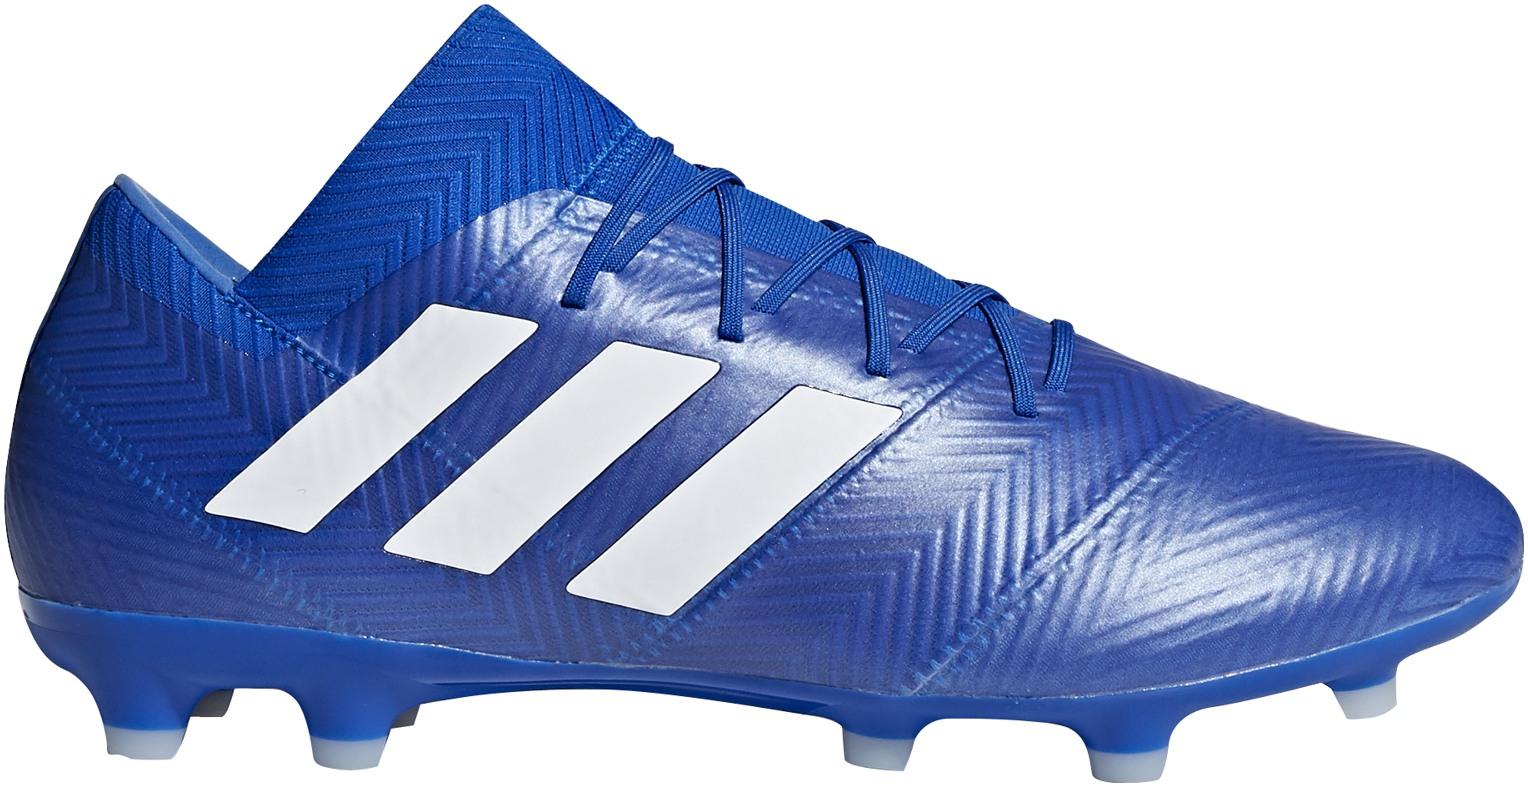 Kopačky lisovky adidas NEMEZIZ 18.2 FG modré  d7aadbccf62